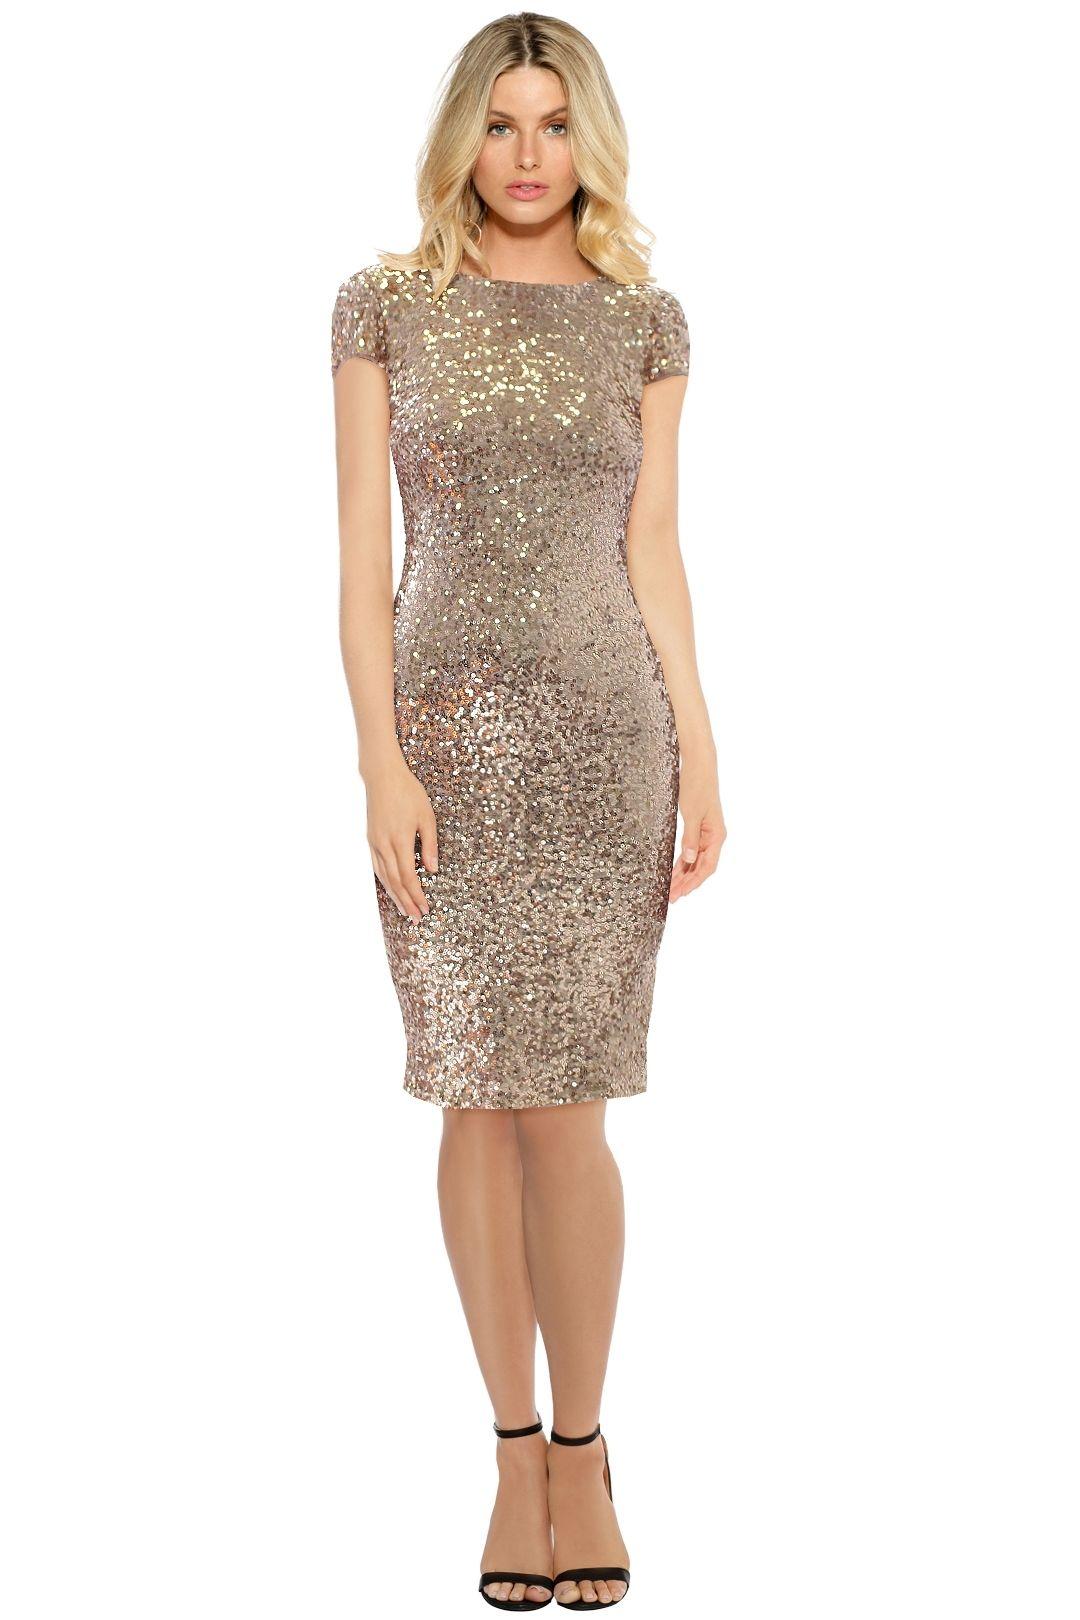 Badgley Mischka - Blush Sequin Cowl Midi Dress - Blush - Front